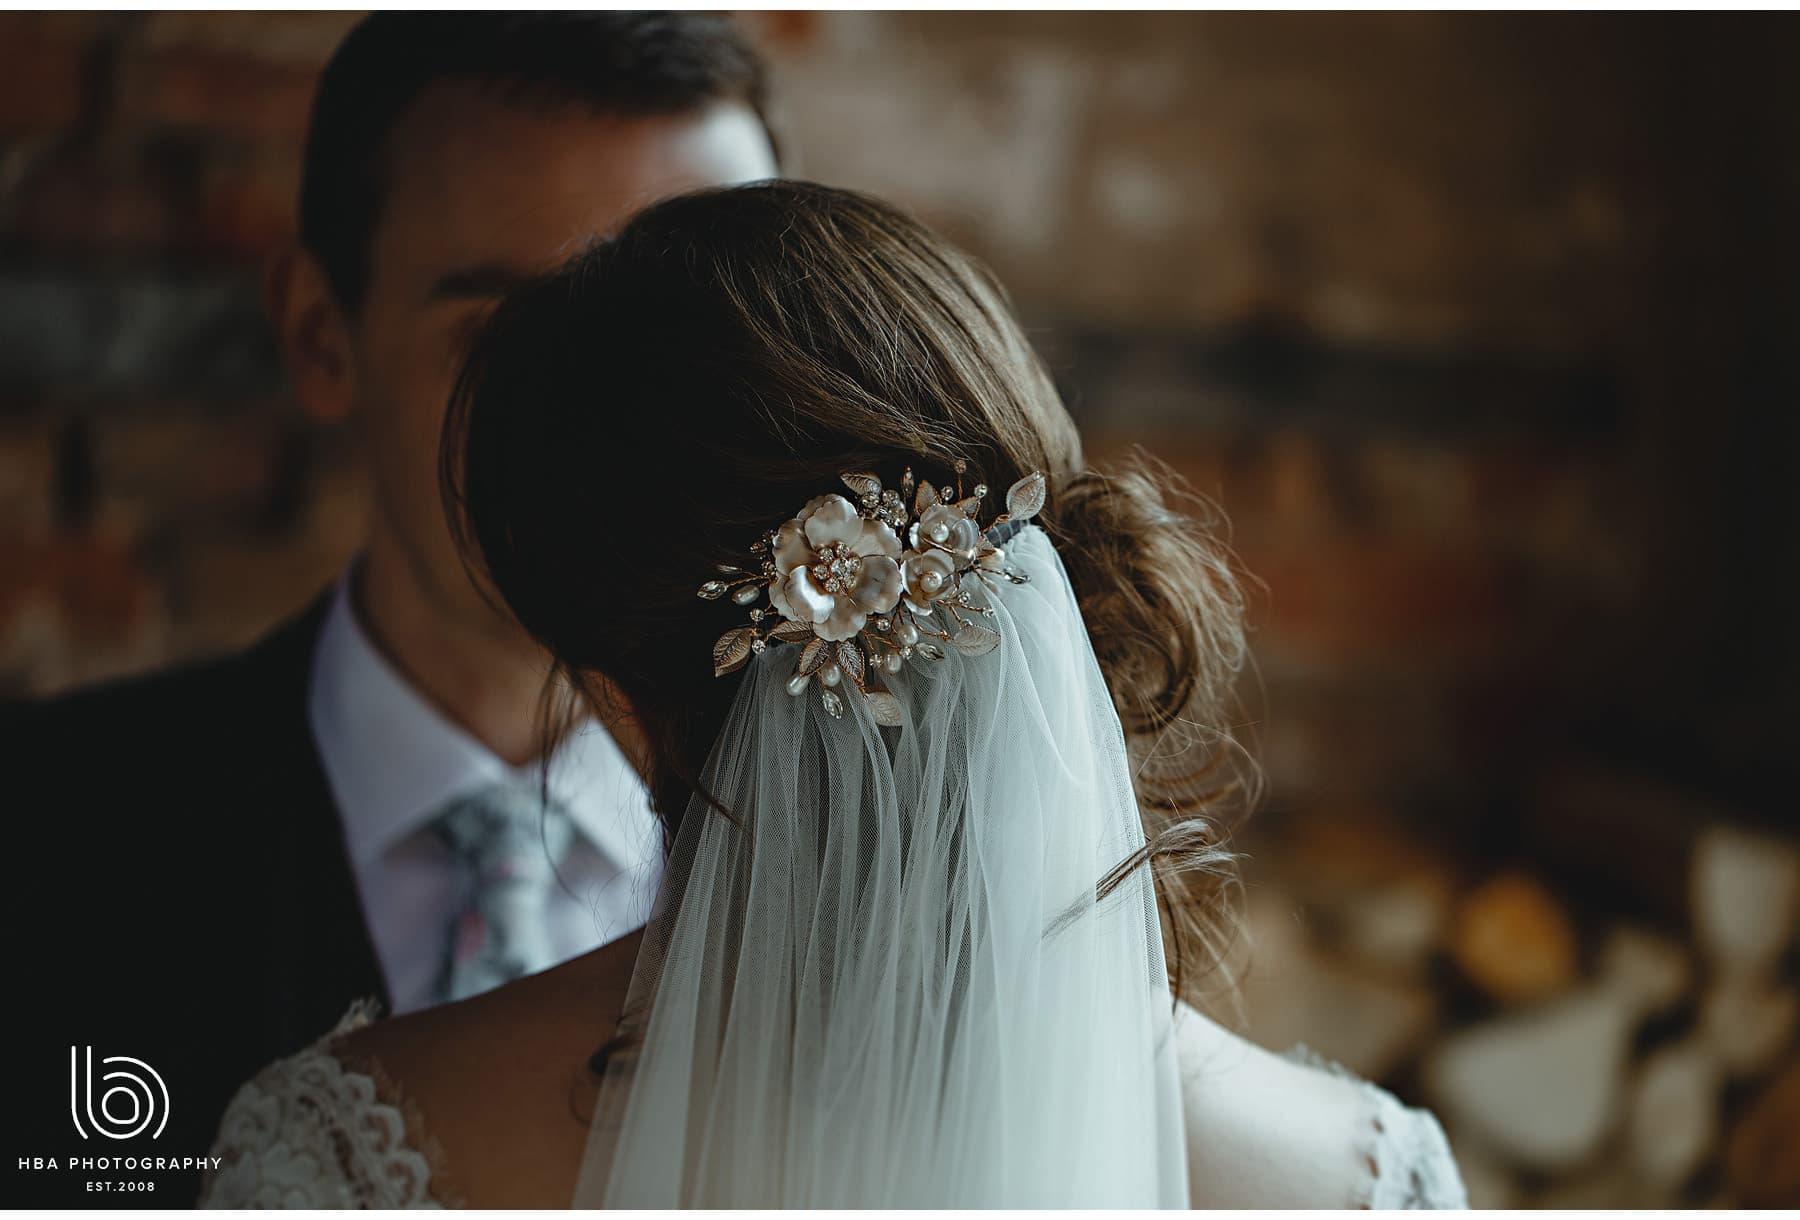 the bride's hair accessory